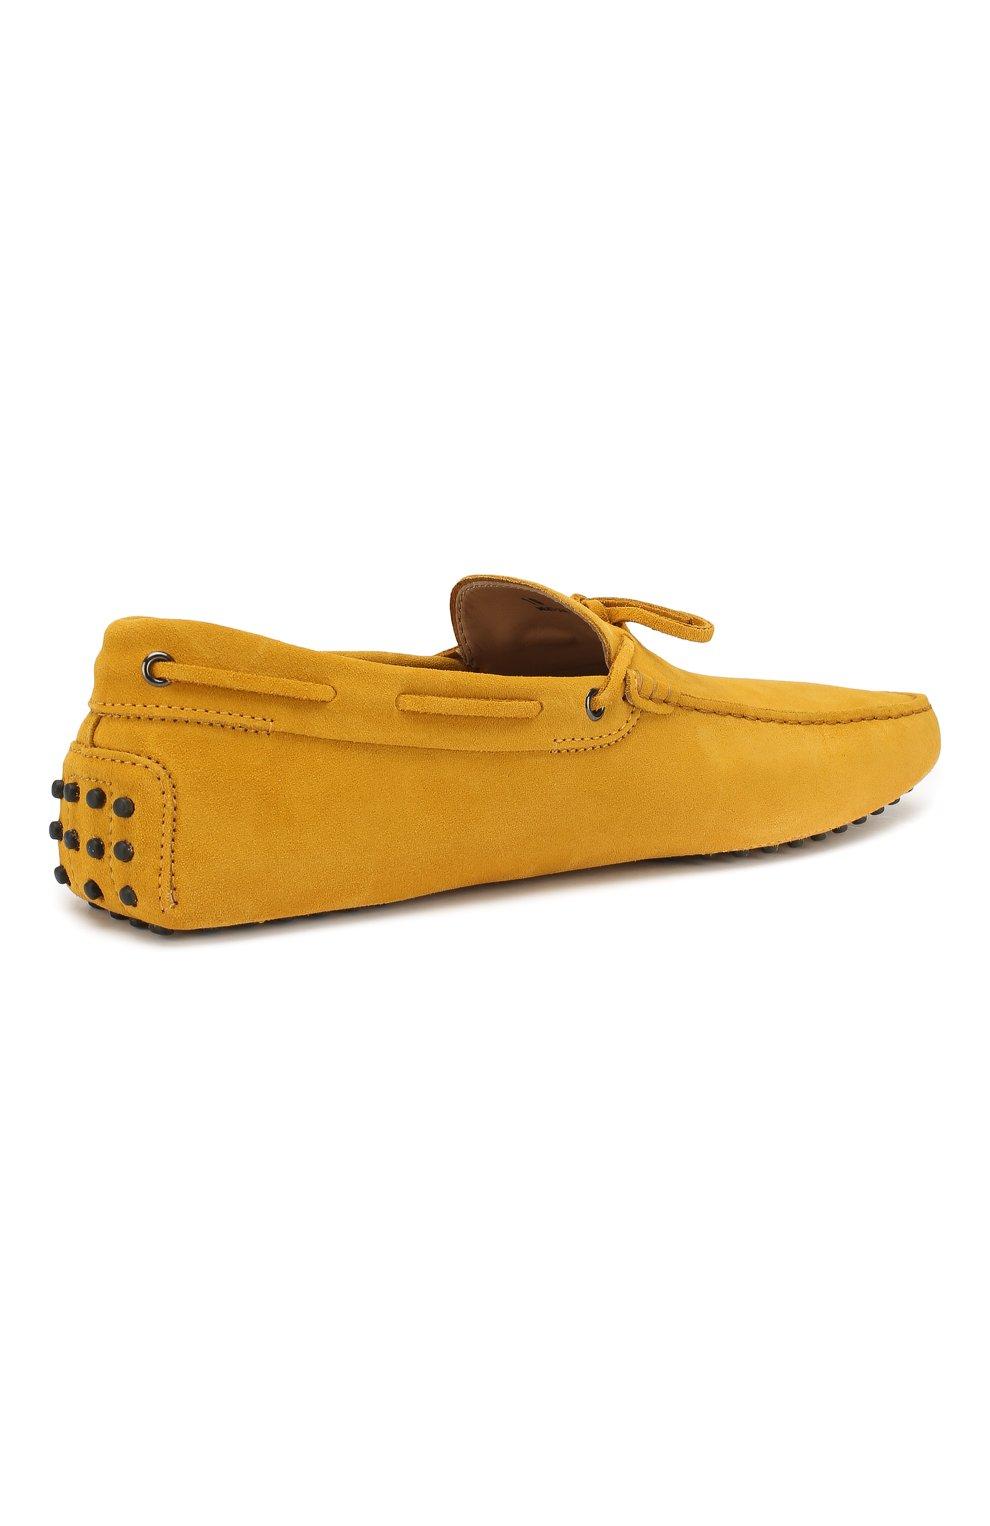 Замшевые мокасины Gommino Driver Tod's желтые | Фото №4